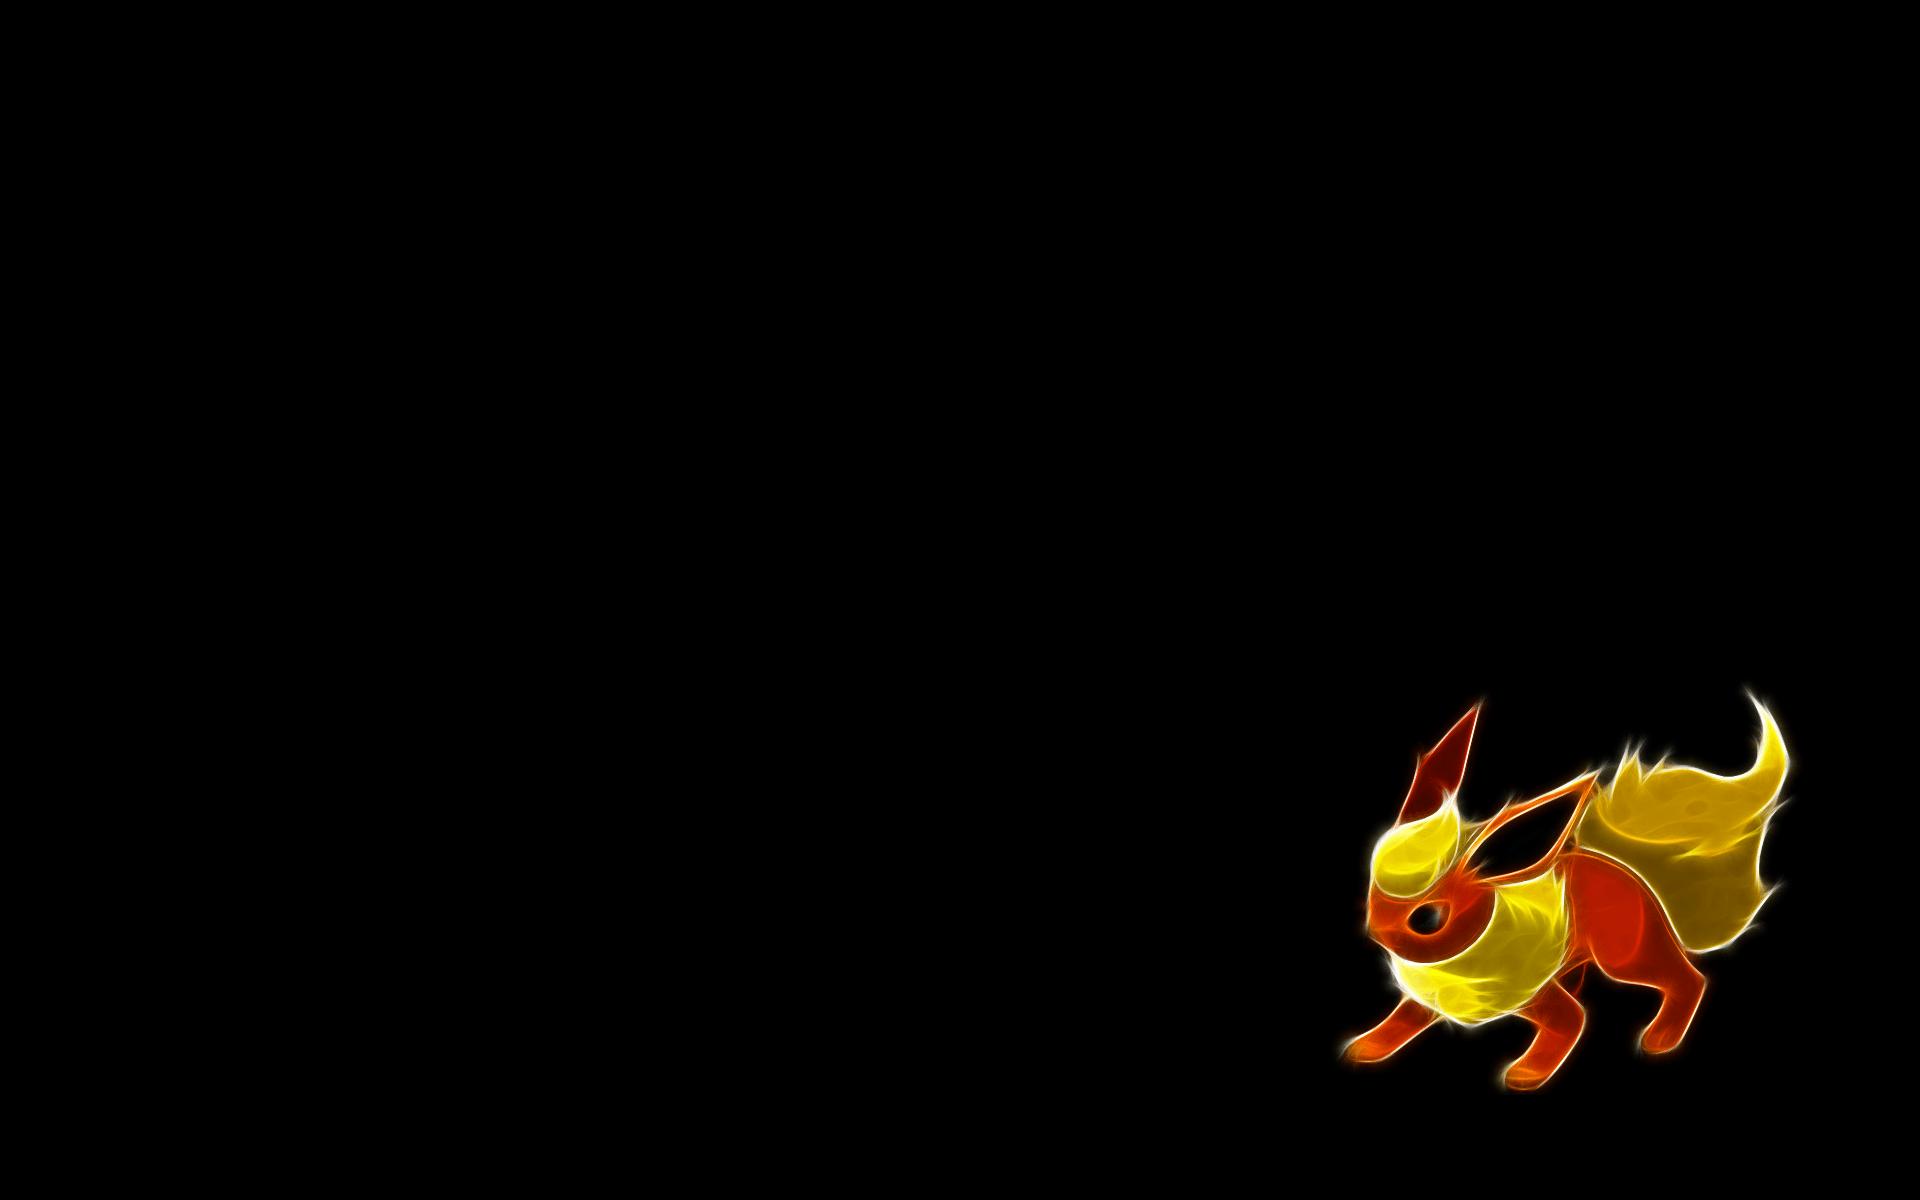 pokemon simple background black - photo #25